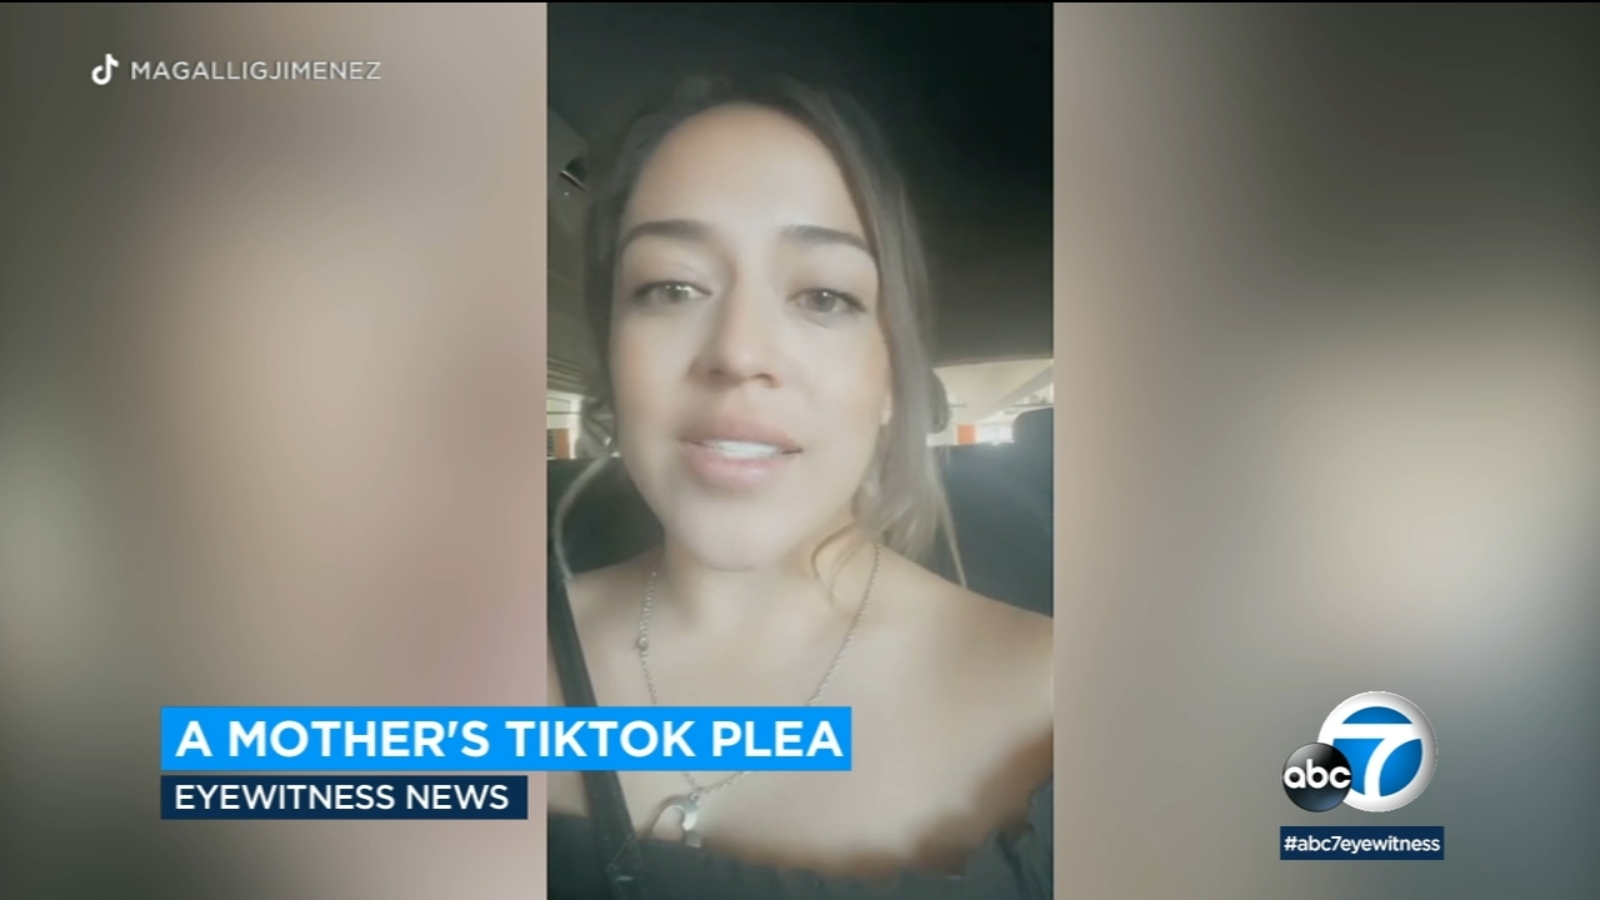 As southern California mom takes toddler to chemo, burglars ransack, vandalize her car